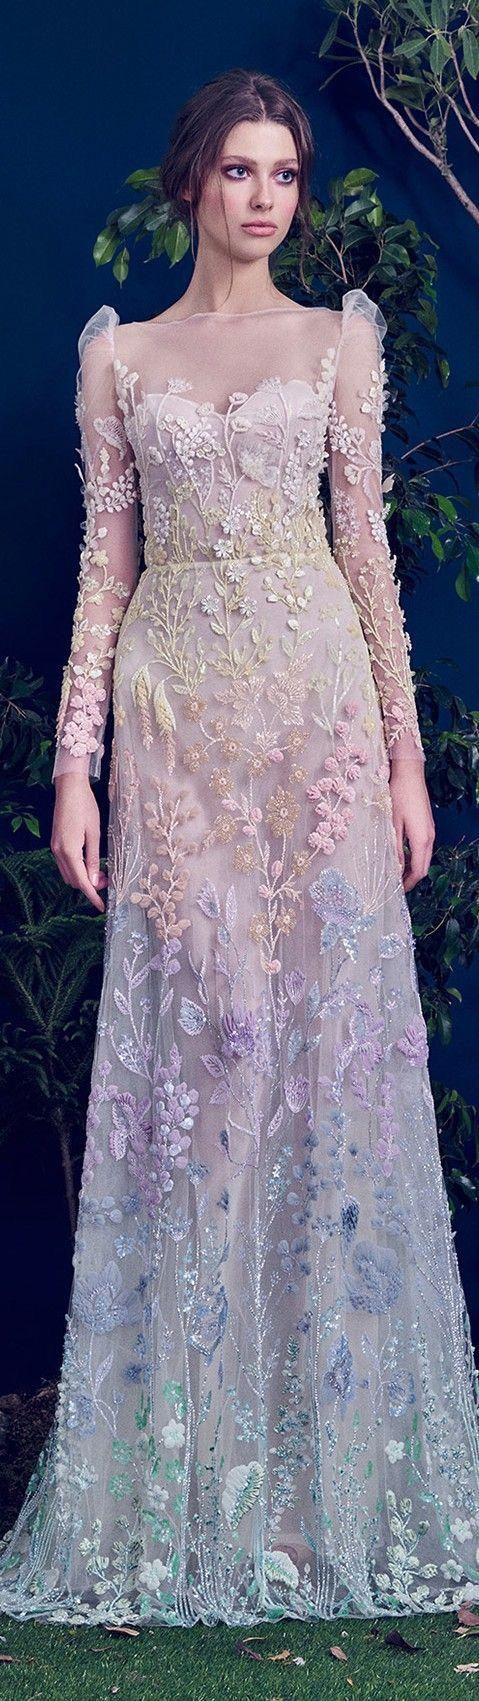 Hamda Al Fahim FW 2016 Wedding Dress Collection